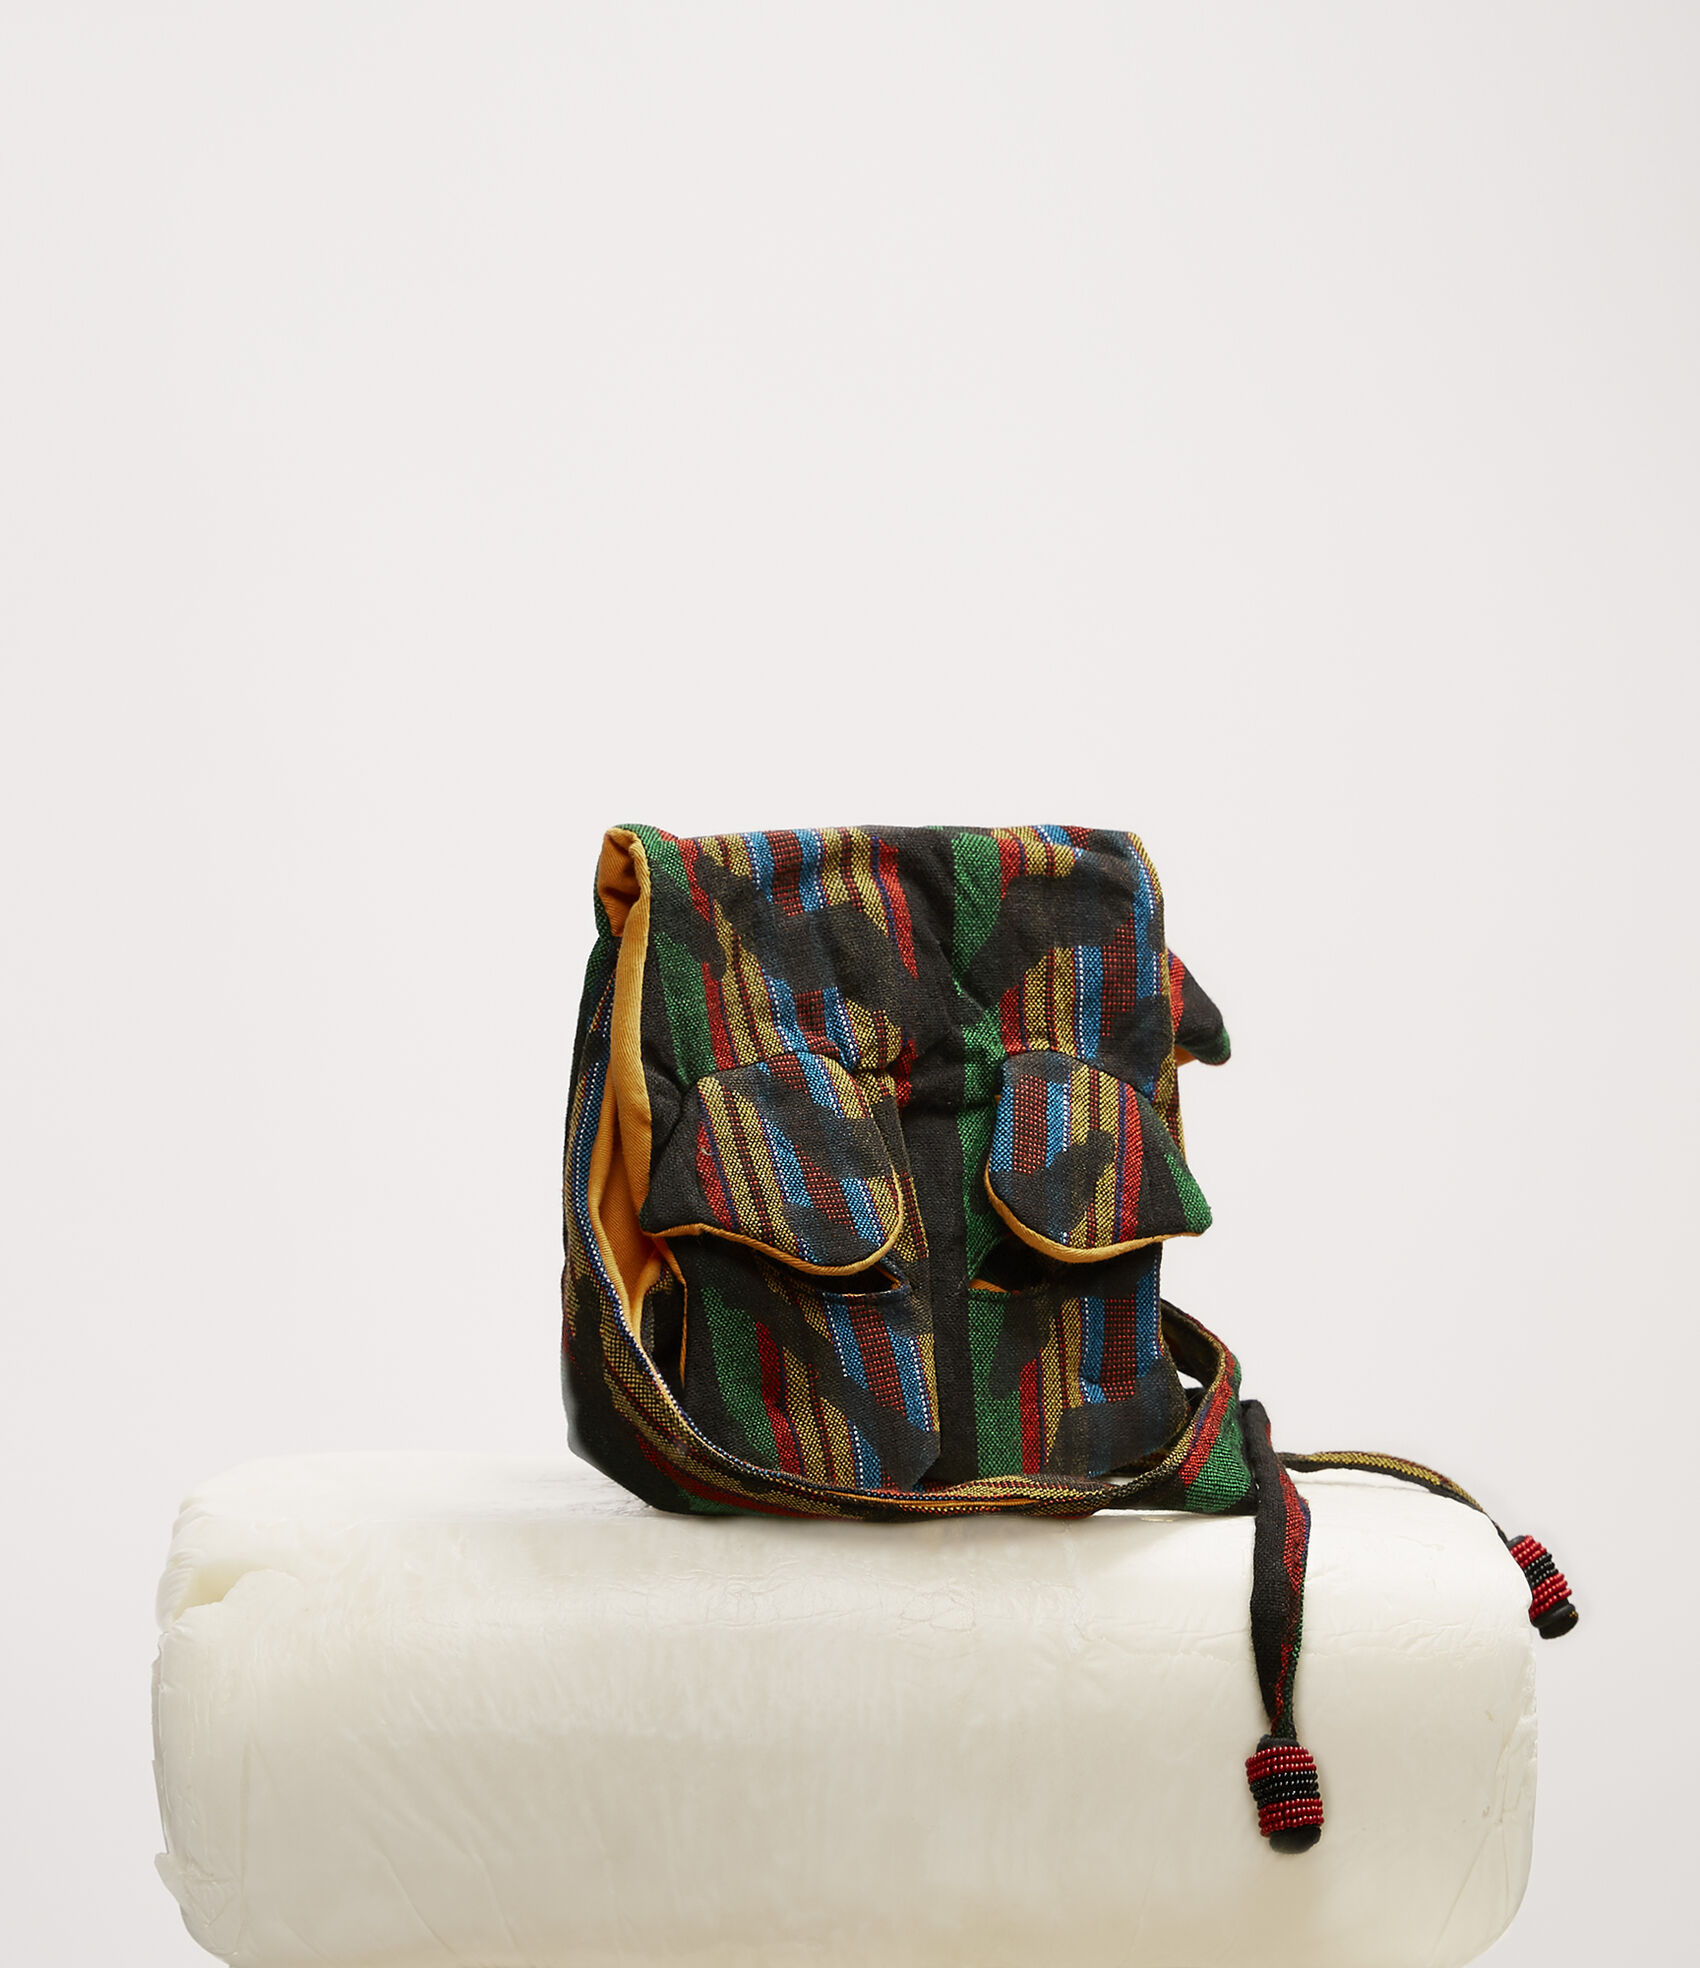 81e5f8b8b309 Vivienne Westwood Crossbody Bags - Mini Tiger Shoulder Bag Multi